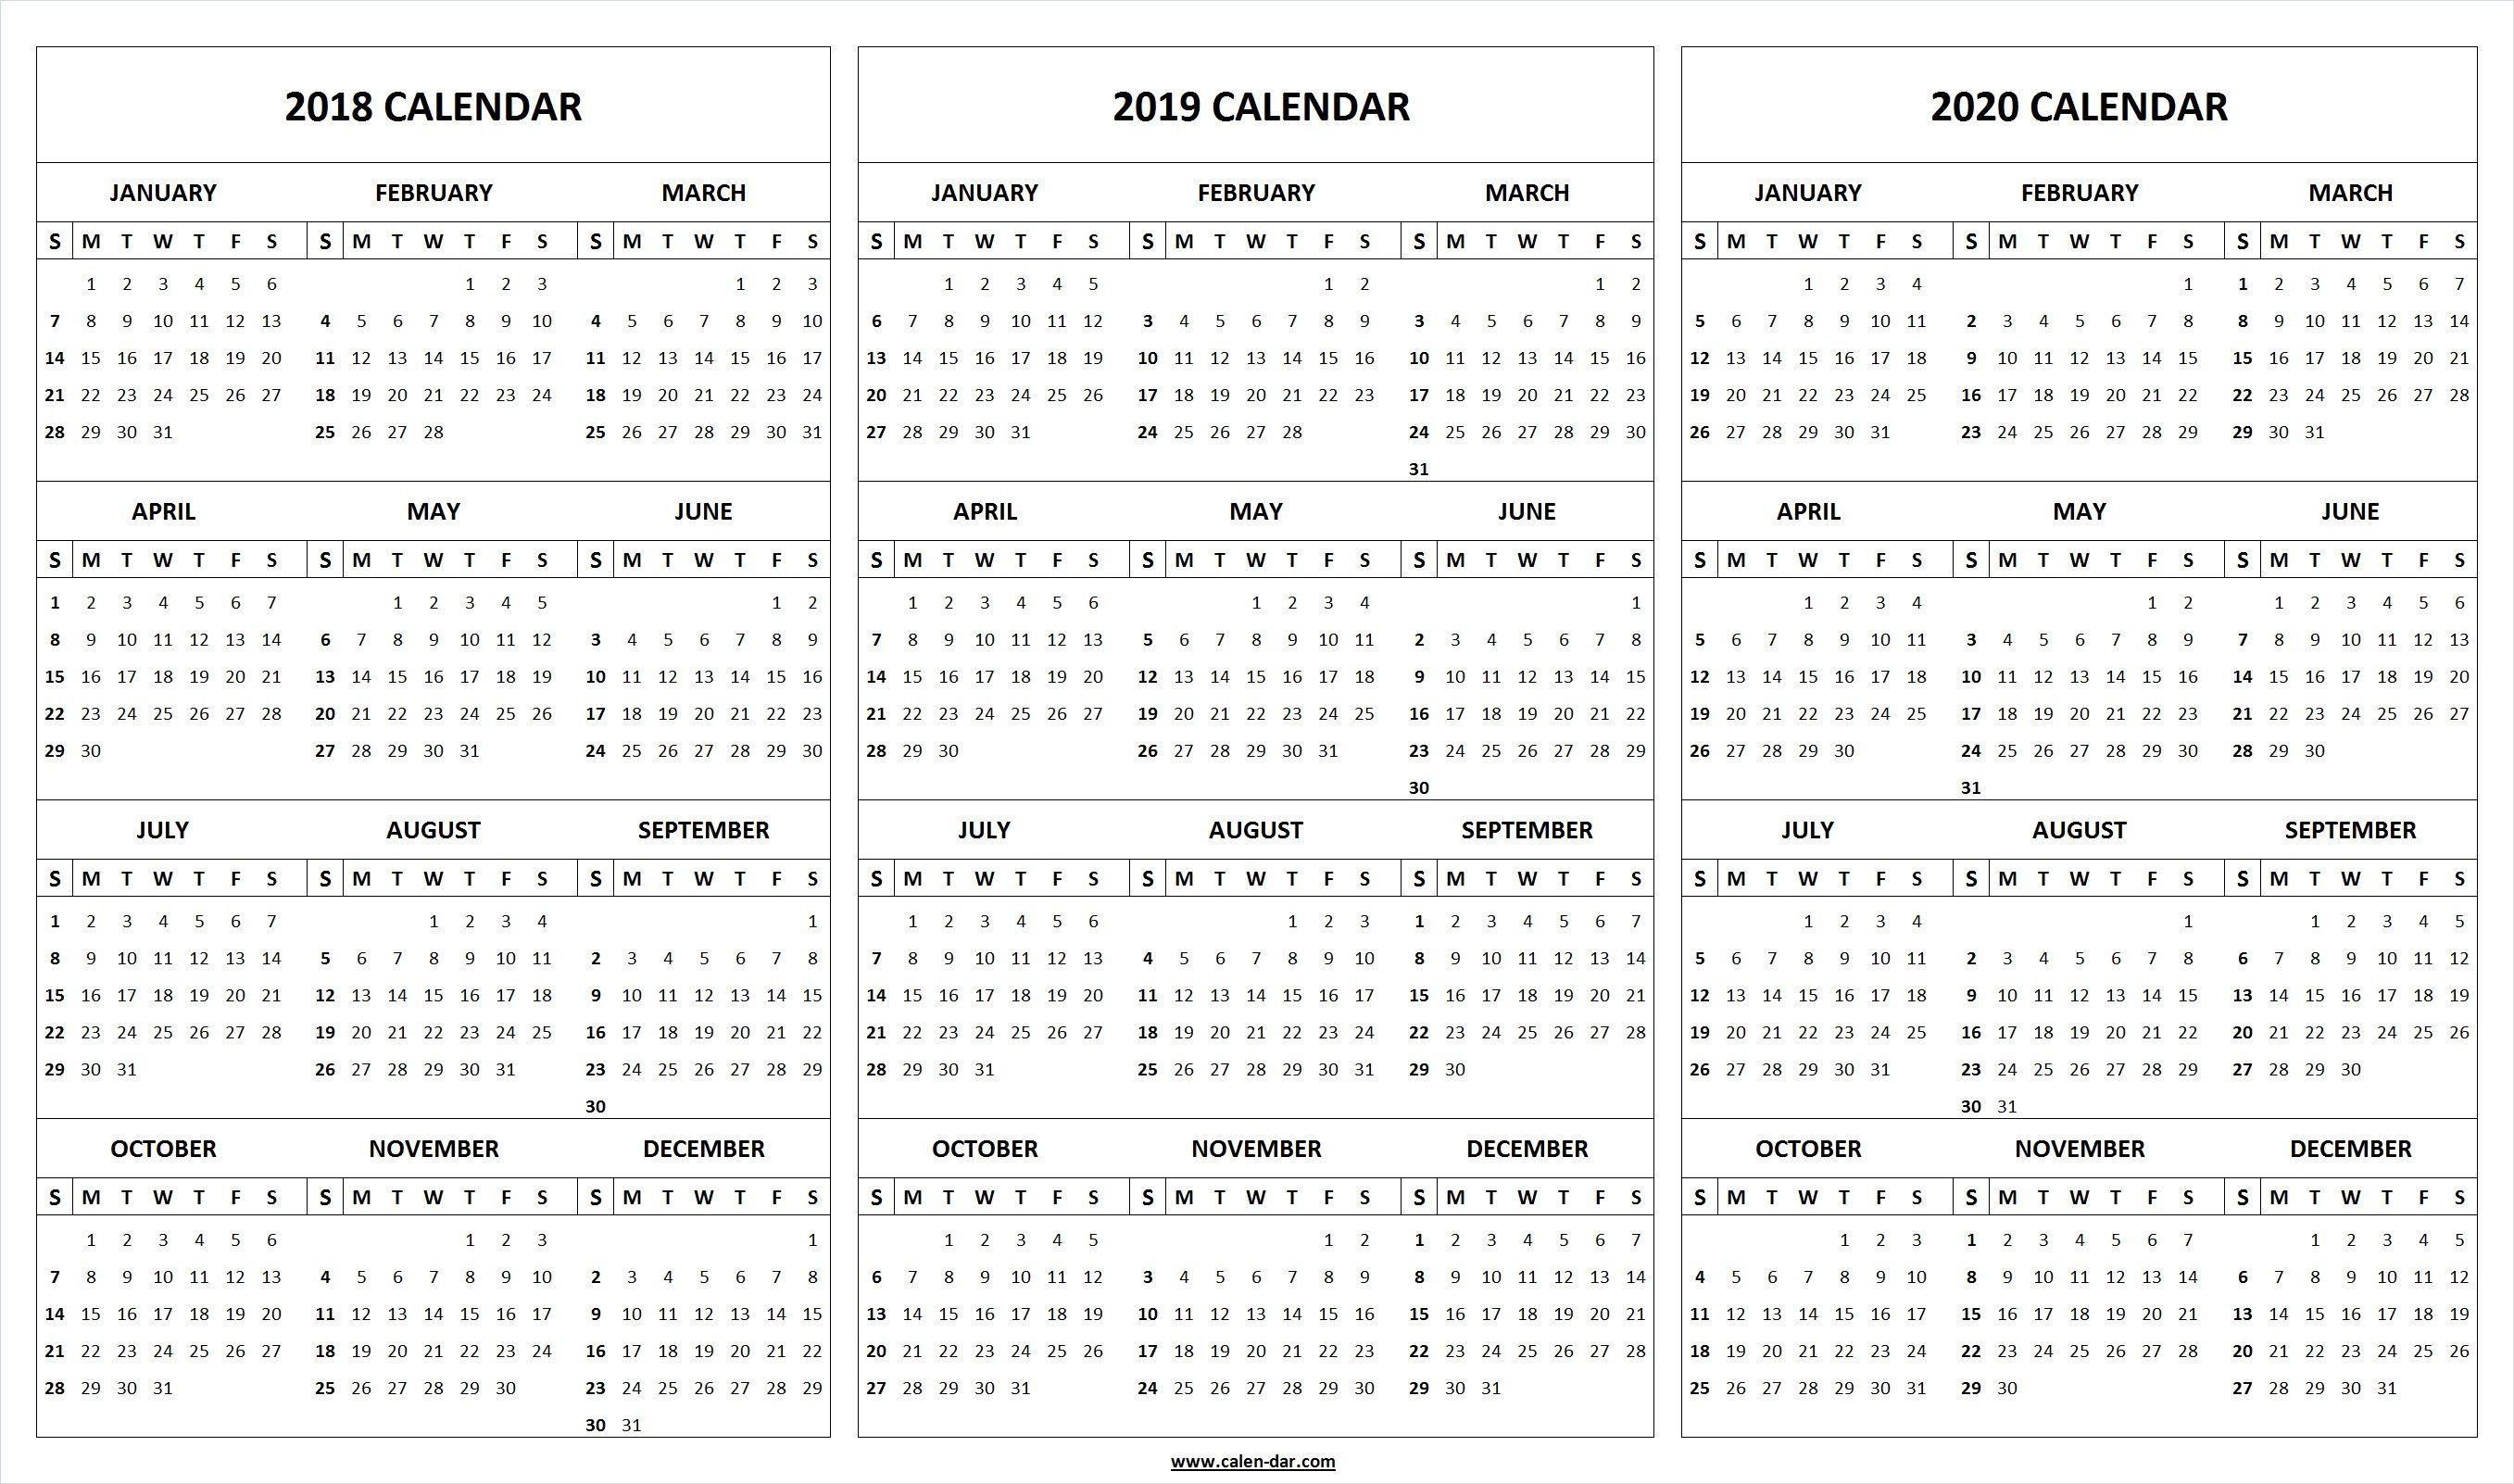 Print Blank 2018 2019 2020 Calendar Template | Organize! | 2019 with Employee Attendance Calendar 2020 Prntable